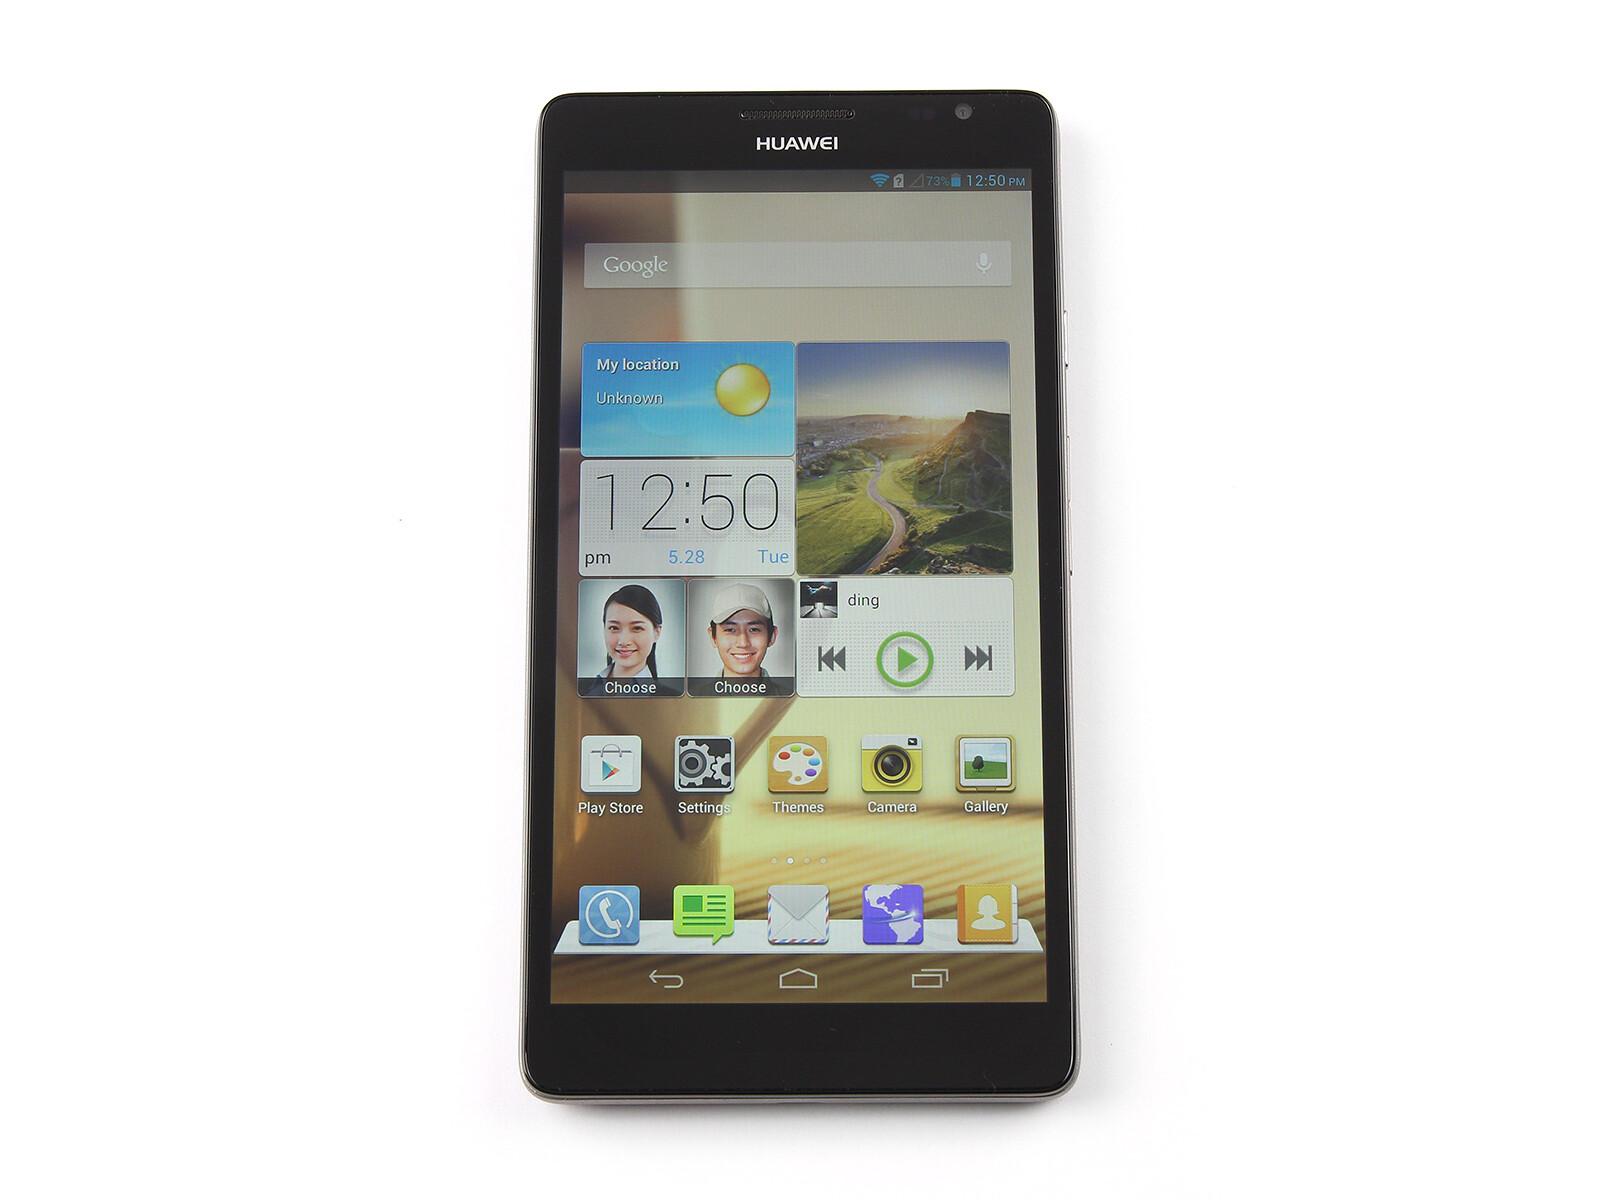 Huawei Ascend Mate Full Specs